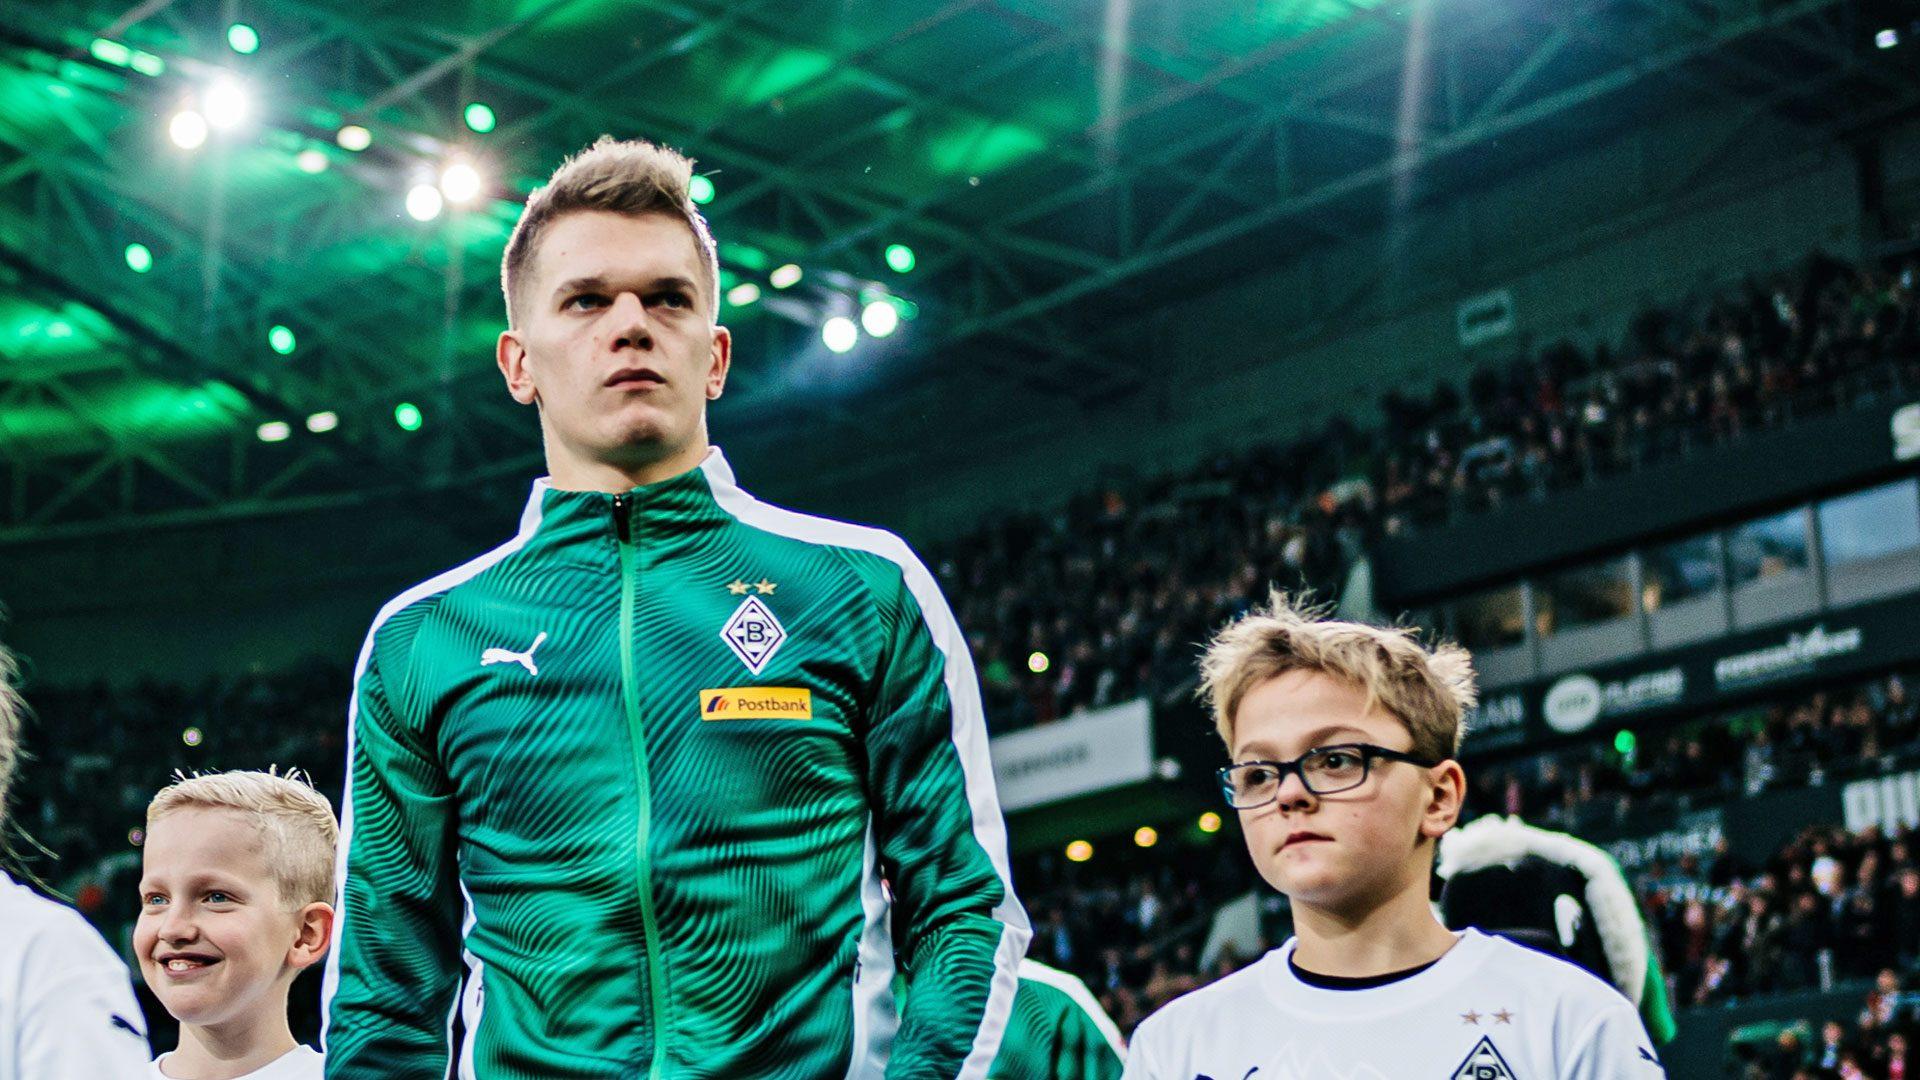 Bundesliga | Matthias Ginter: the Bundesliga's most underrated defender looking to lead Borussia Mönchengladbach and Germany to glory